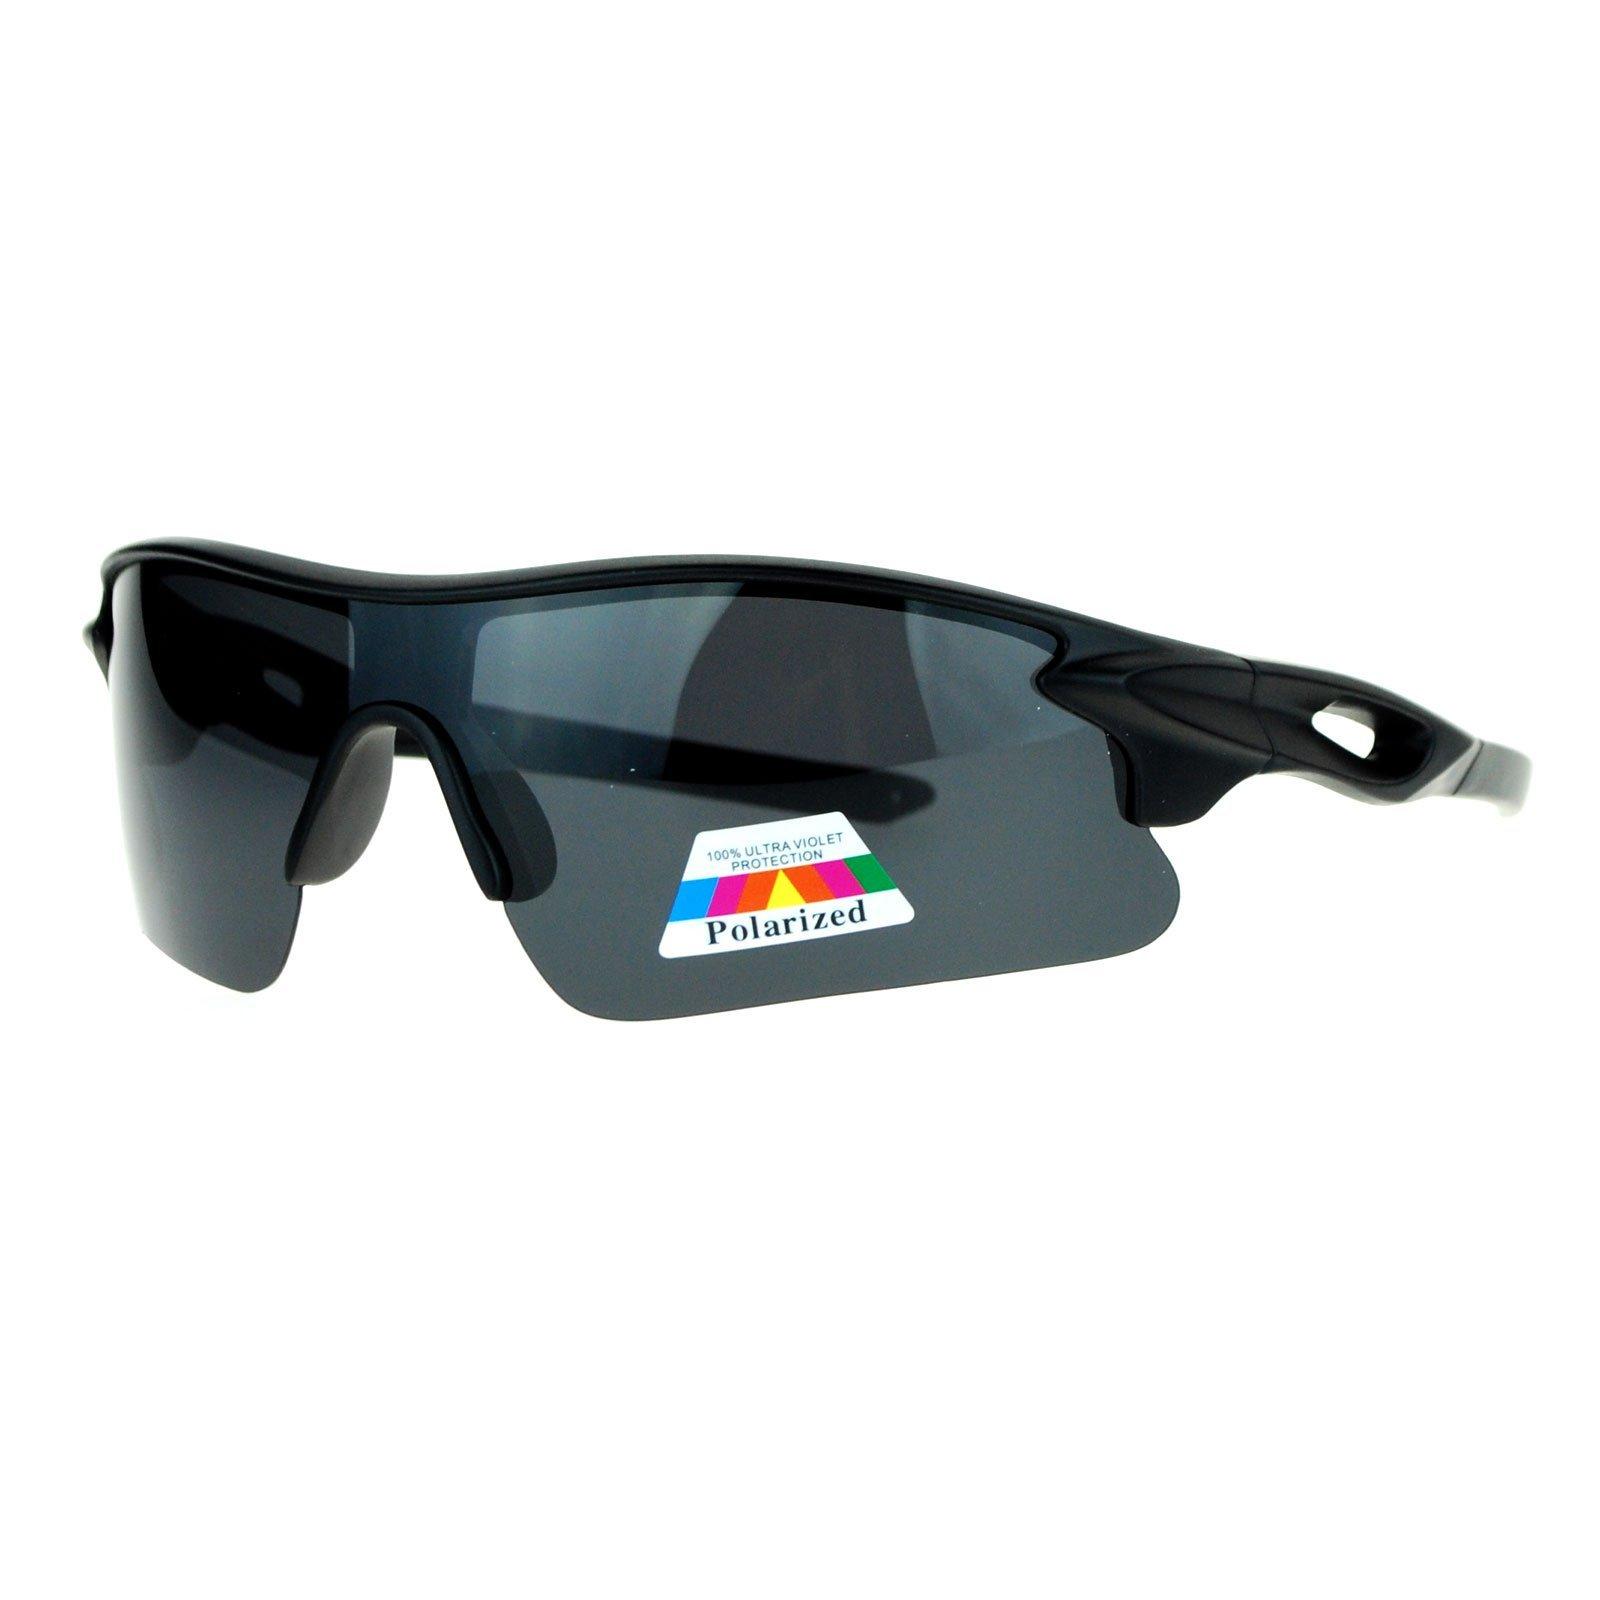 SA106 Anti Glare Polarized Lens Half Rim Baseball Warp Sport Sunglasses Matte Bl